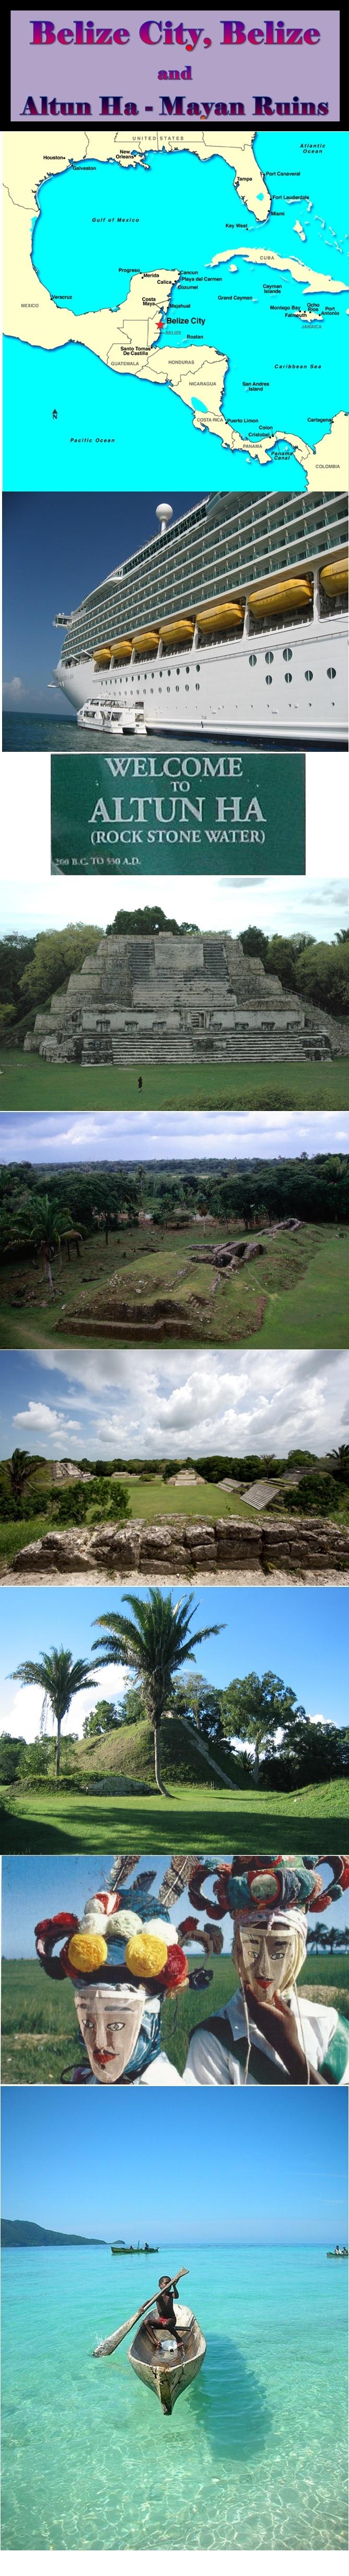 Belize City Belize Altun Ha Mayan Ruins